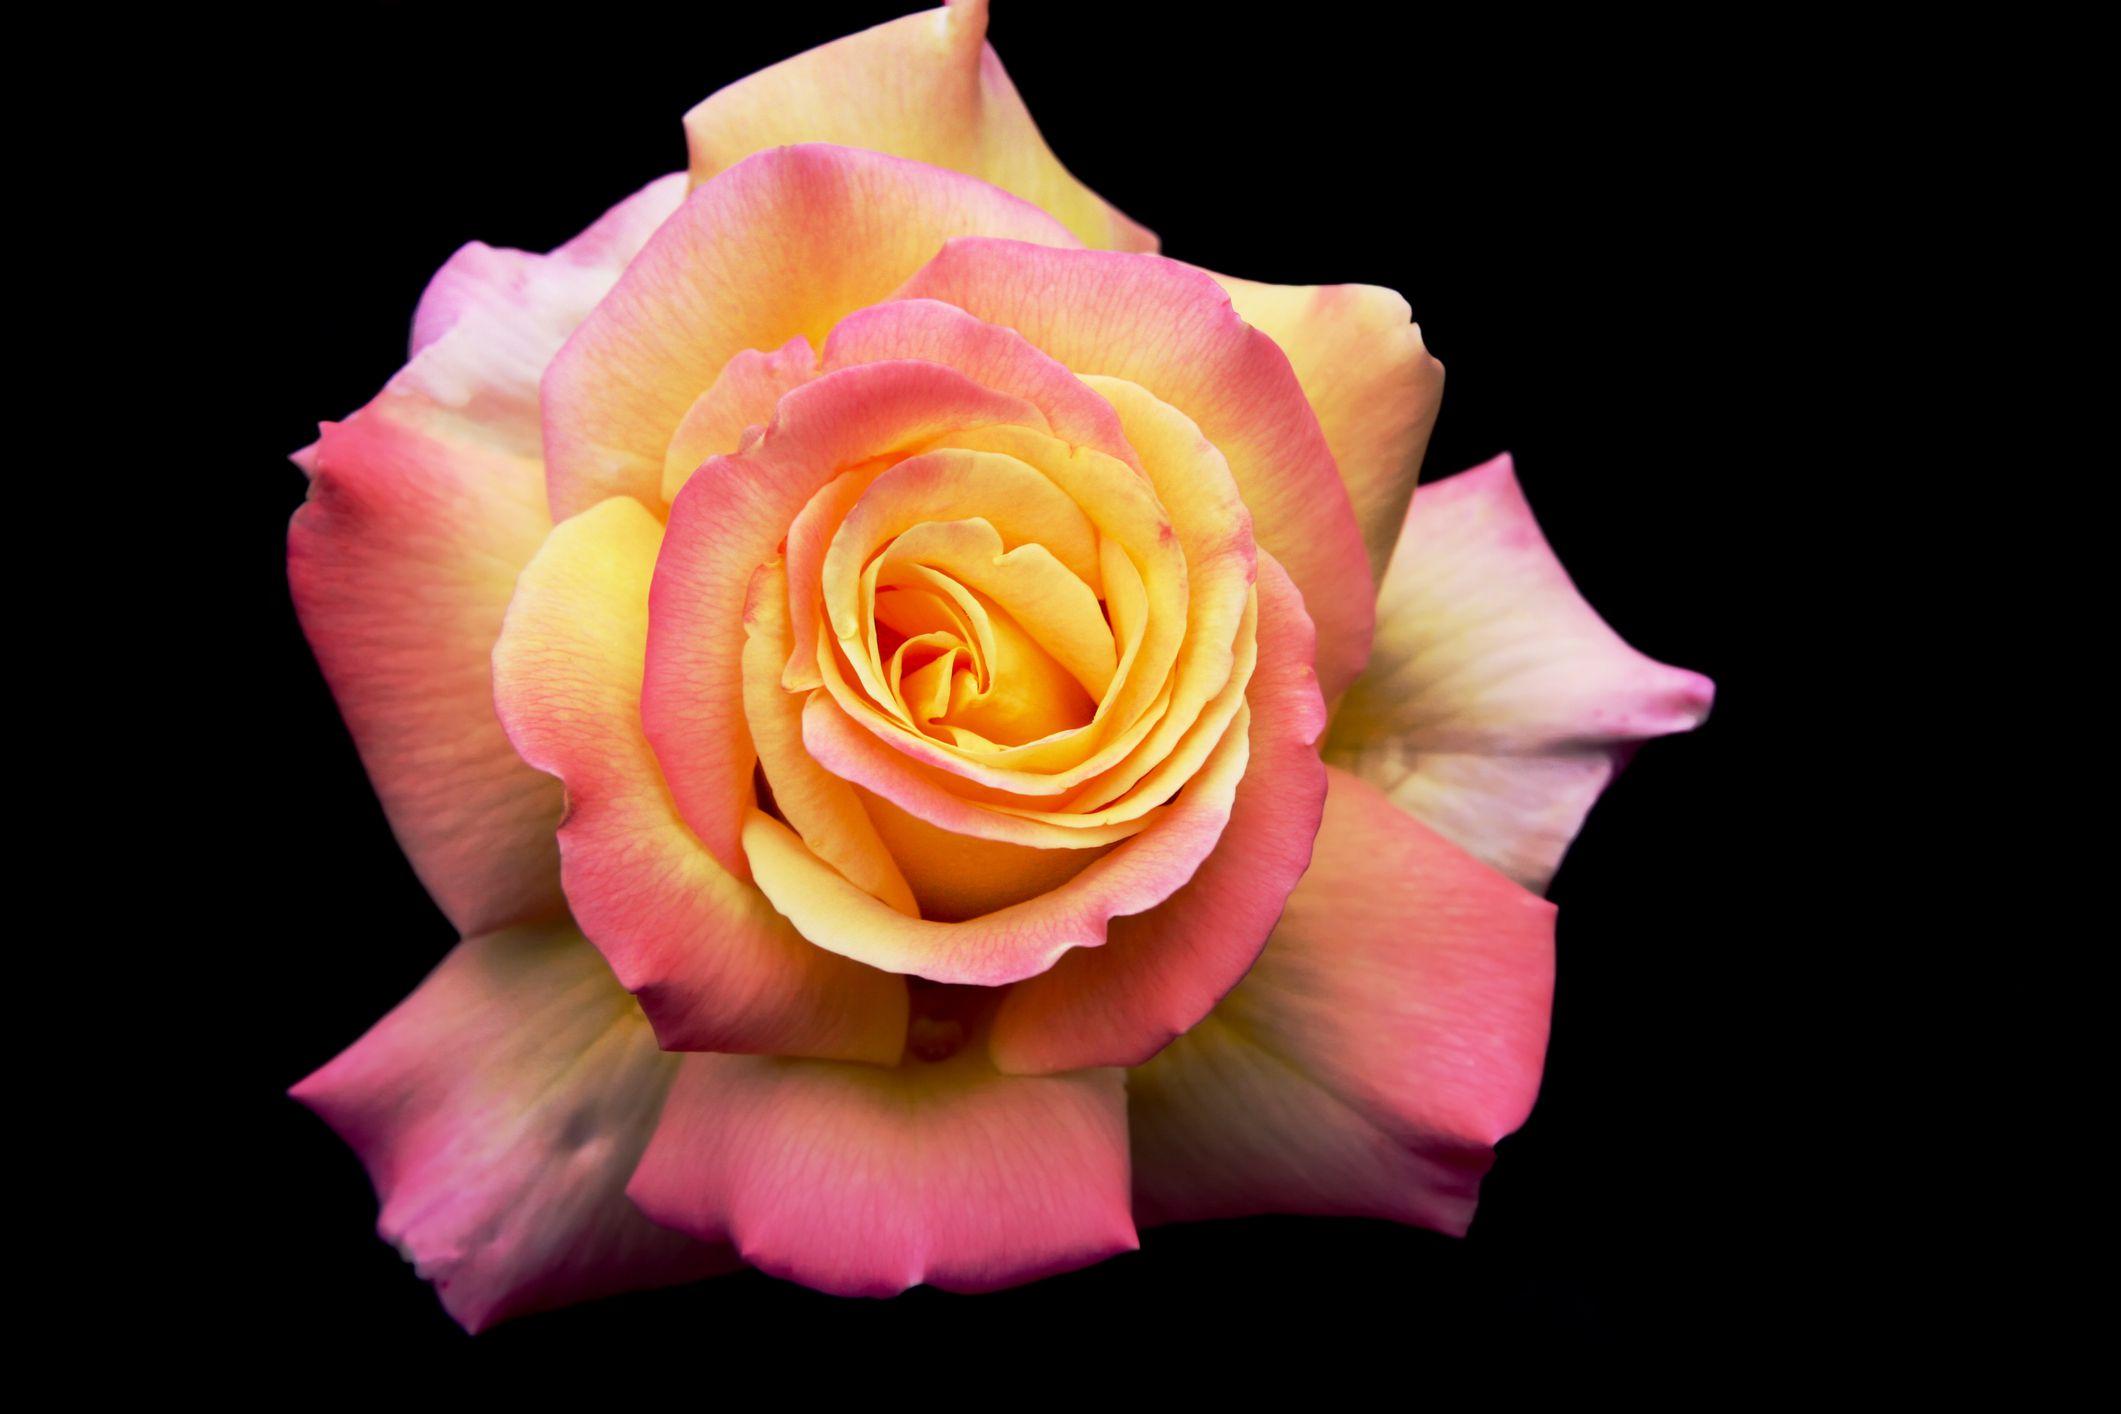 Closeup of Peace rose flower.